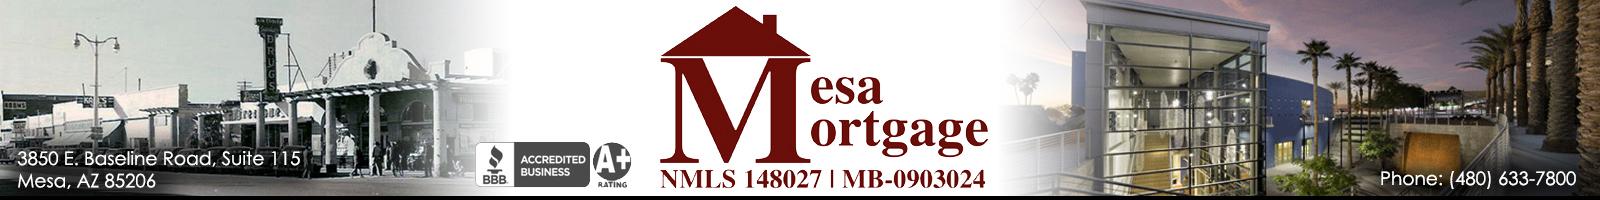 Mesa Arizona Property Tax Rate